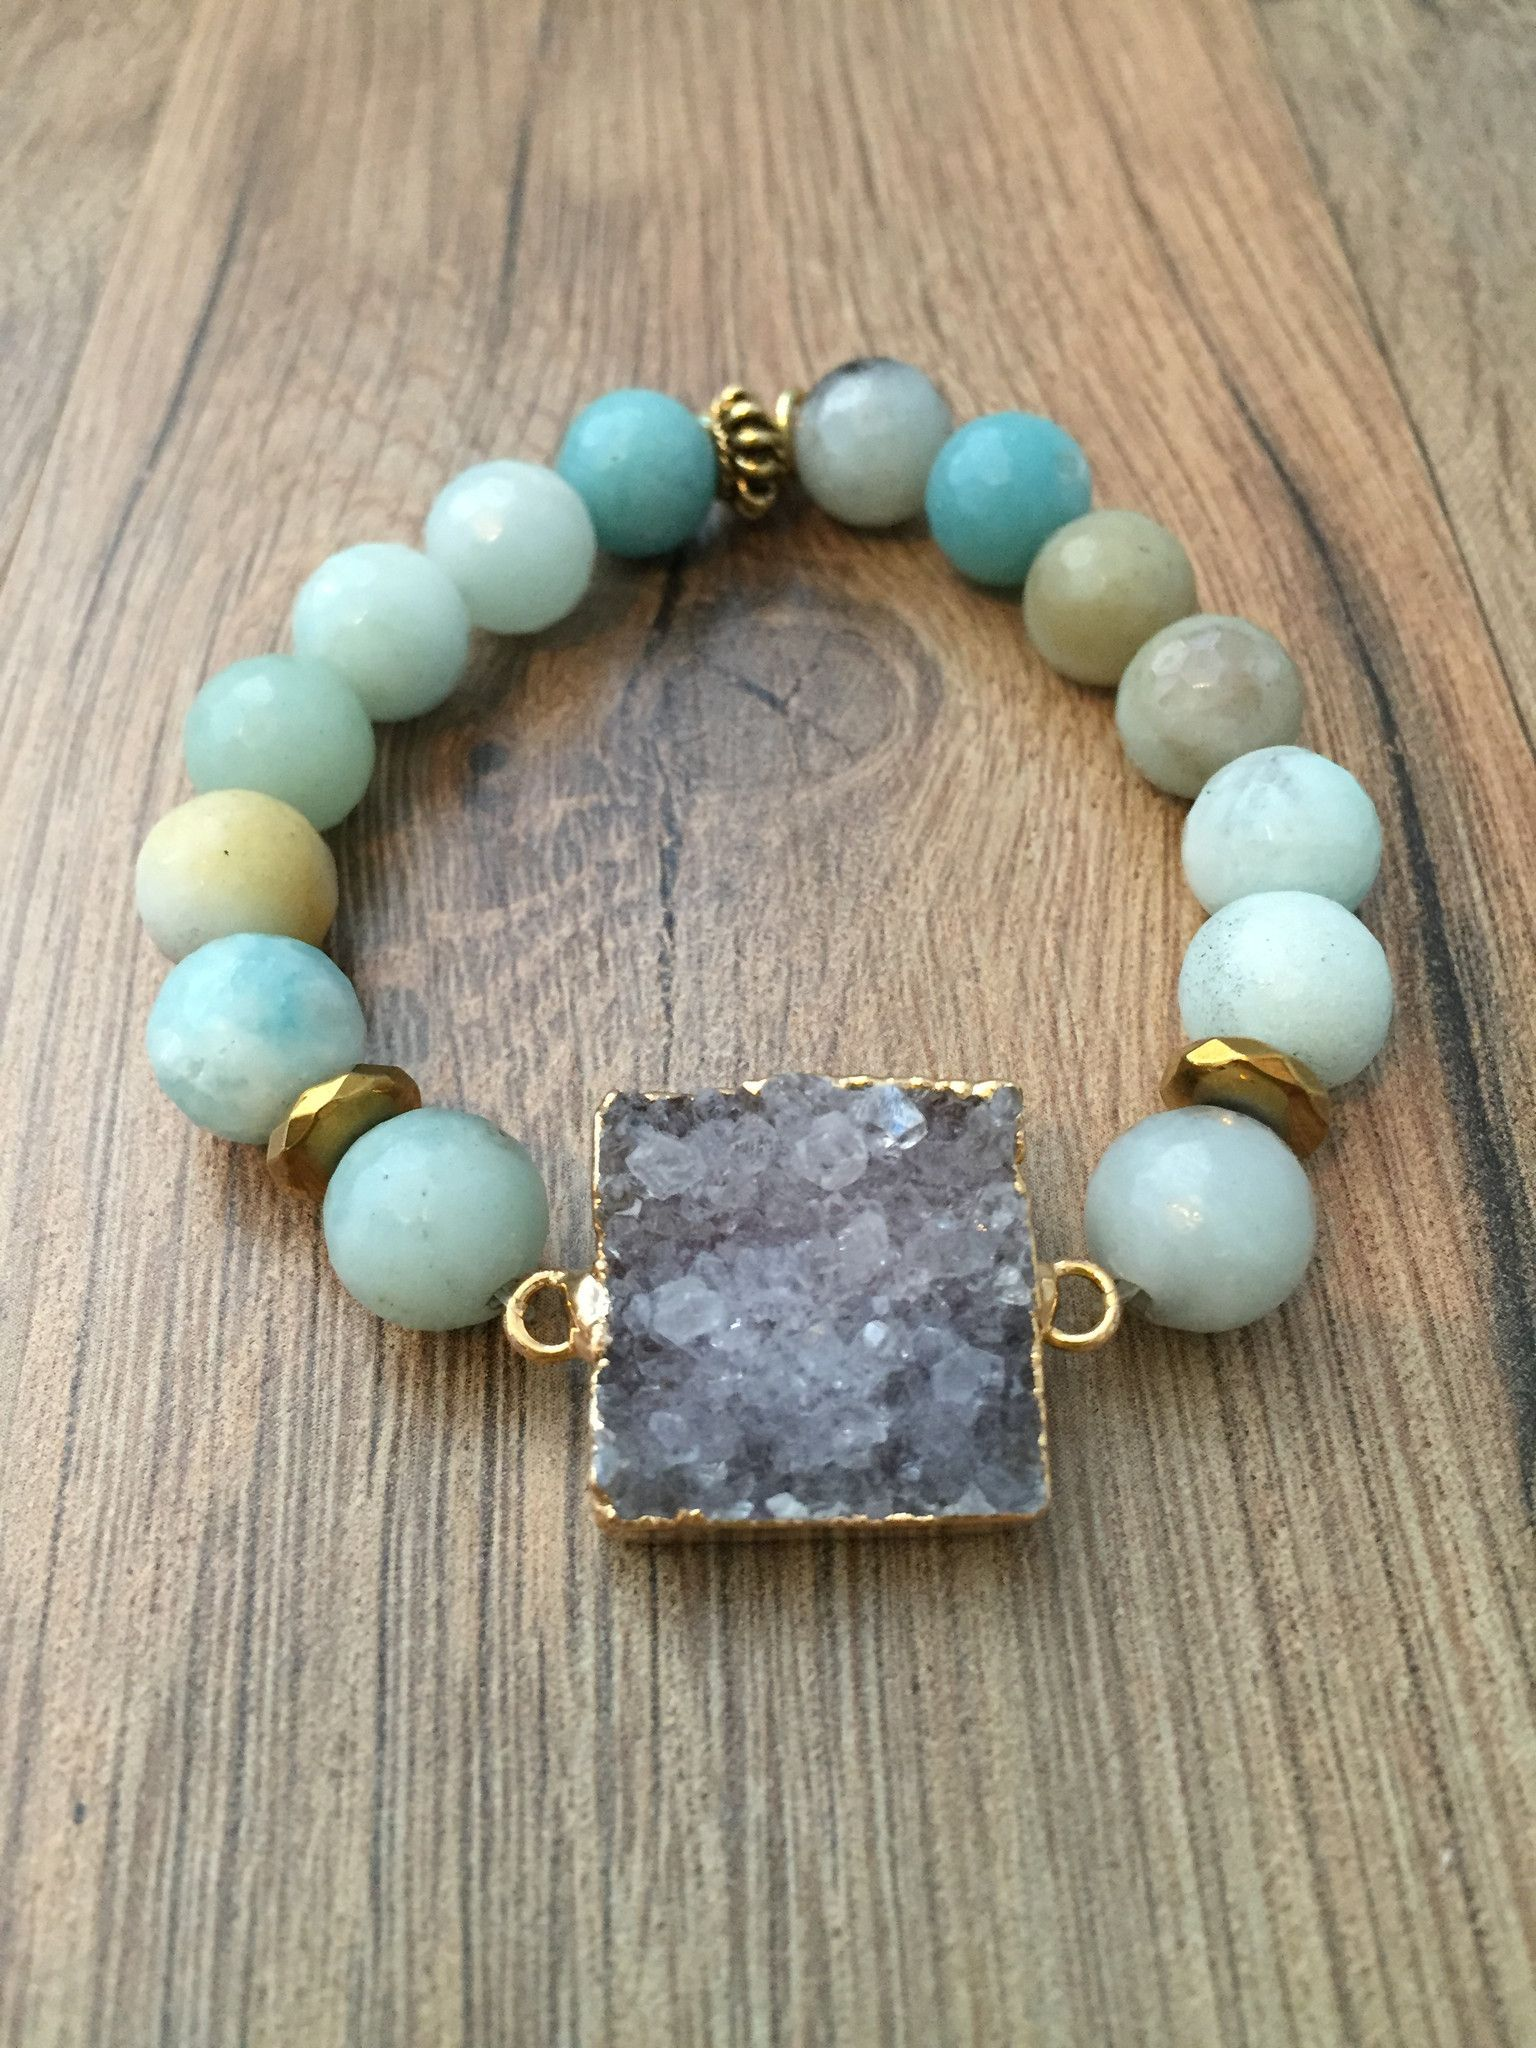 Druzy Stone Bracelet                                                                                                                                                                                 More